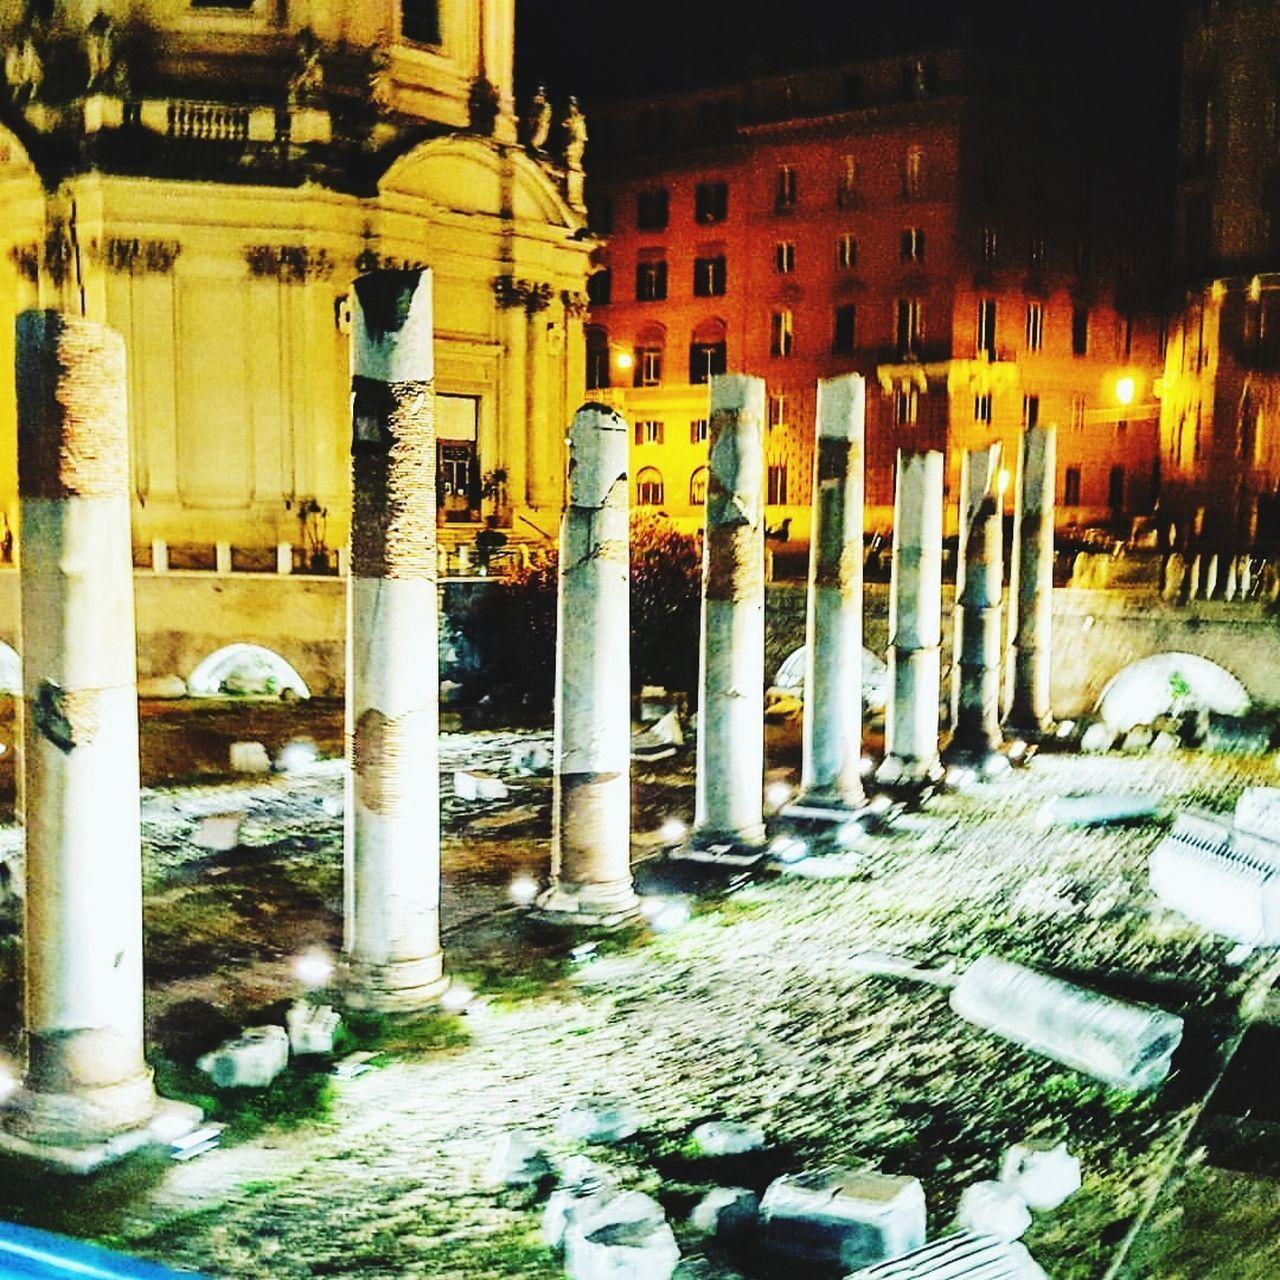 Architectural Column Architecture Illuminated Outdoors Rome Italy Travel Destinations